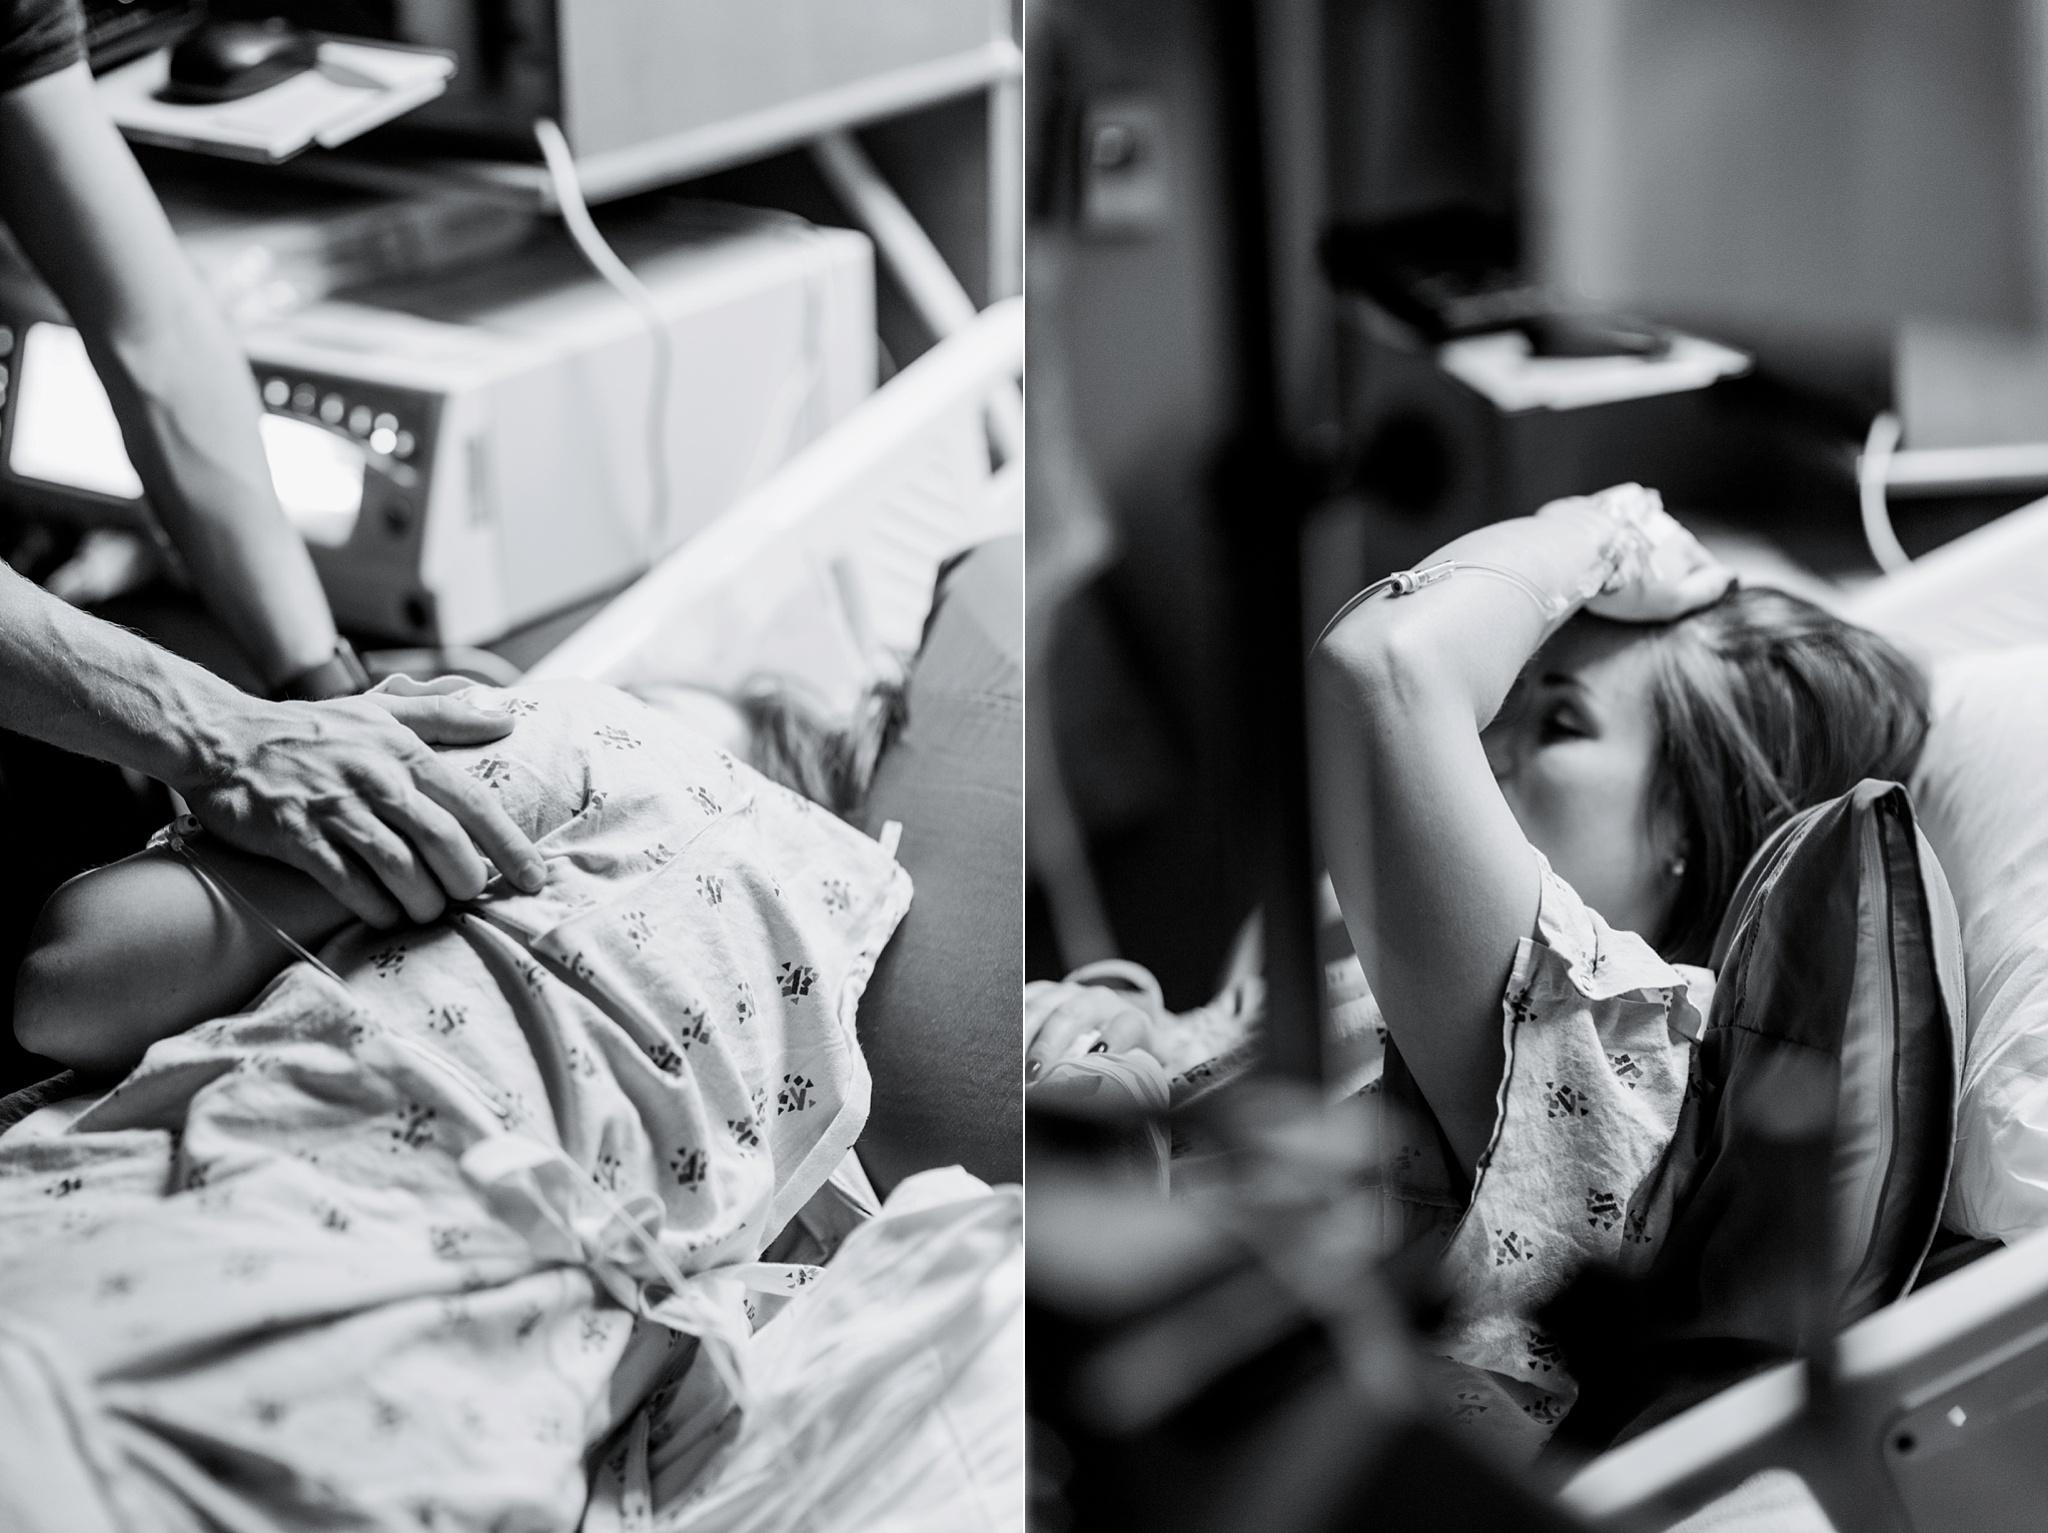 fayetteville-georgia-piedmont-fayette-hospital-birth-photography-sarahmoore-53.jpg